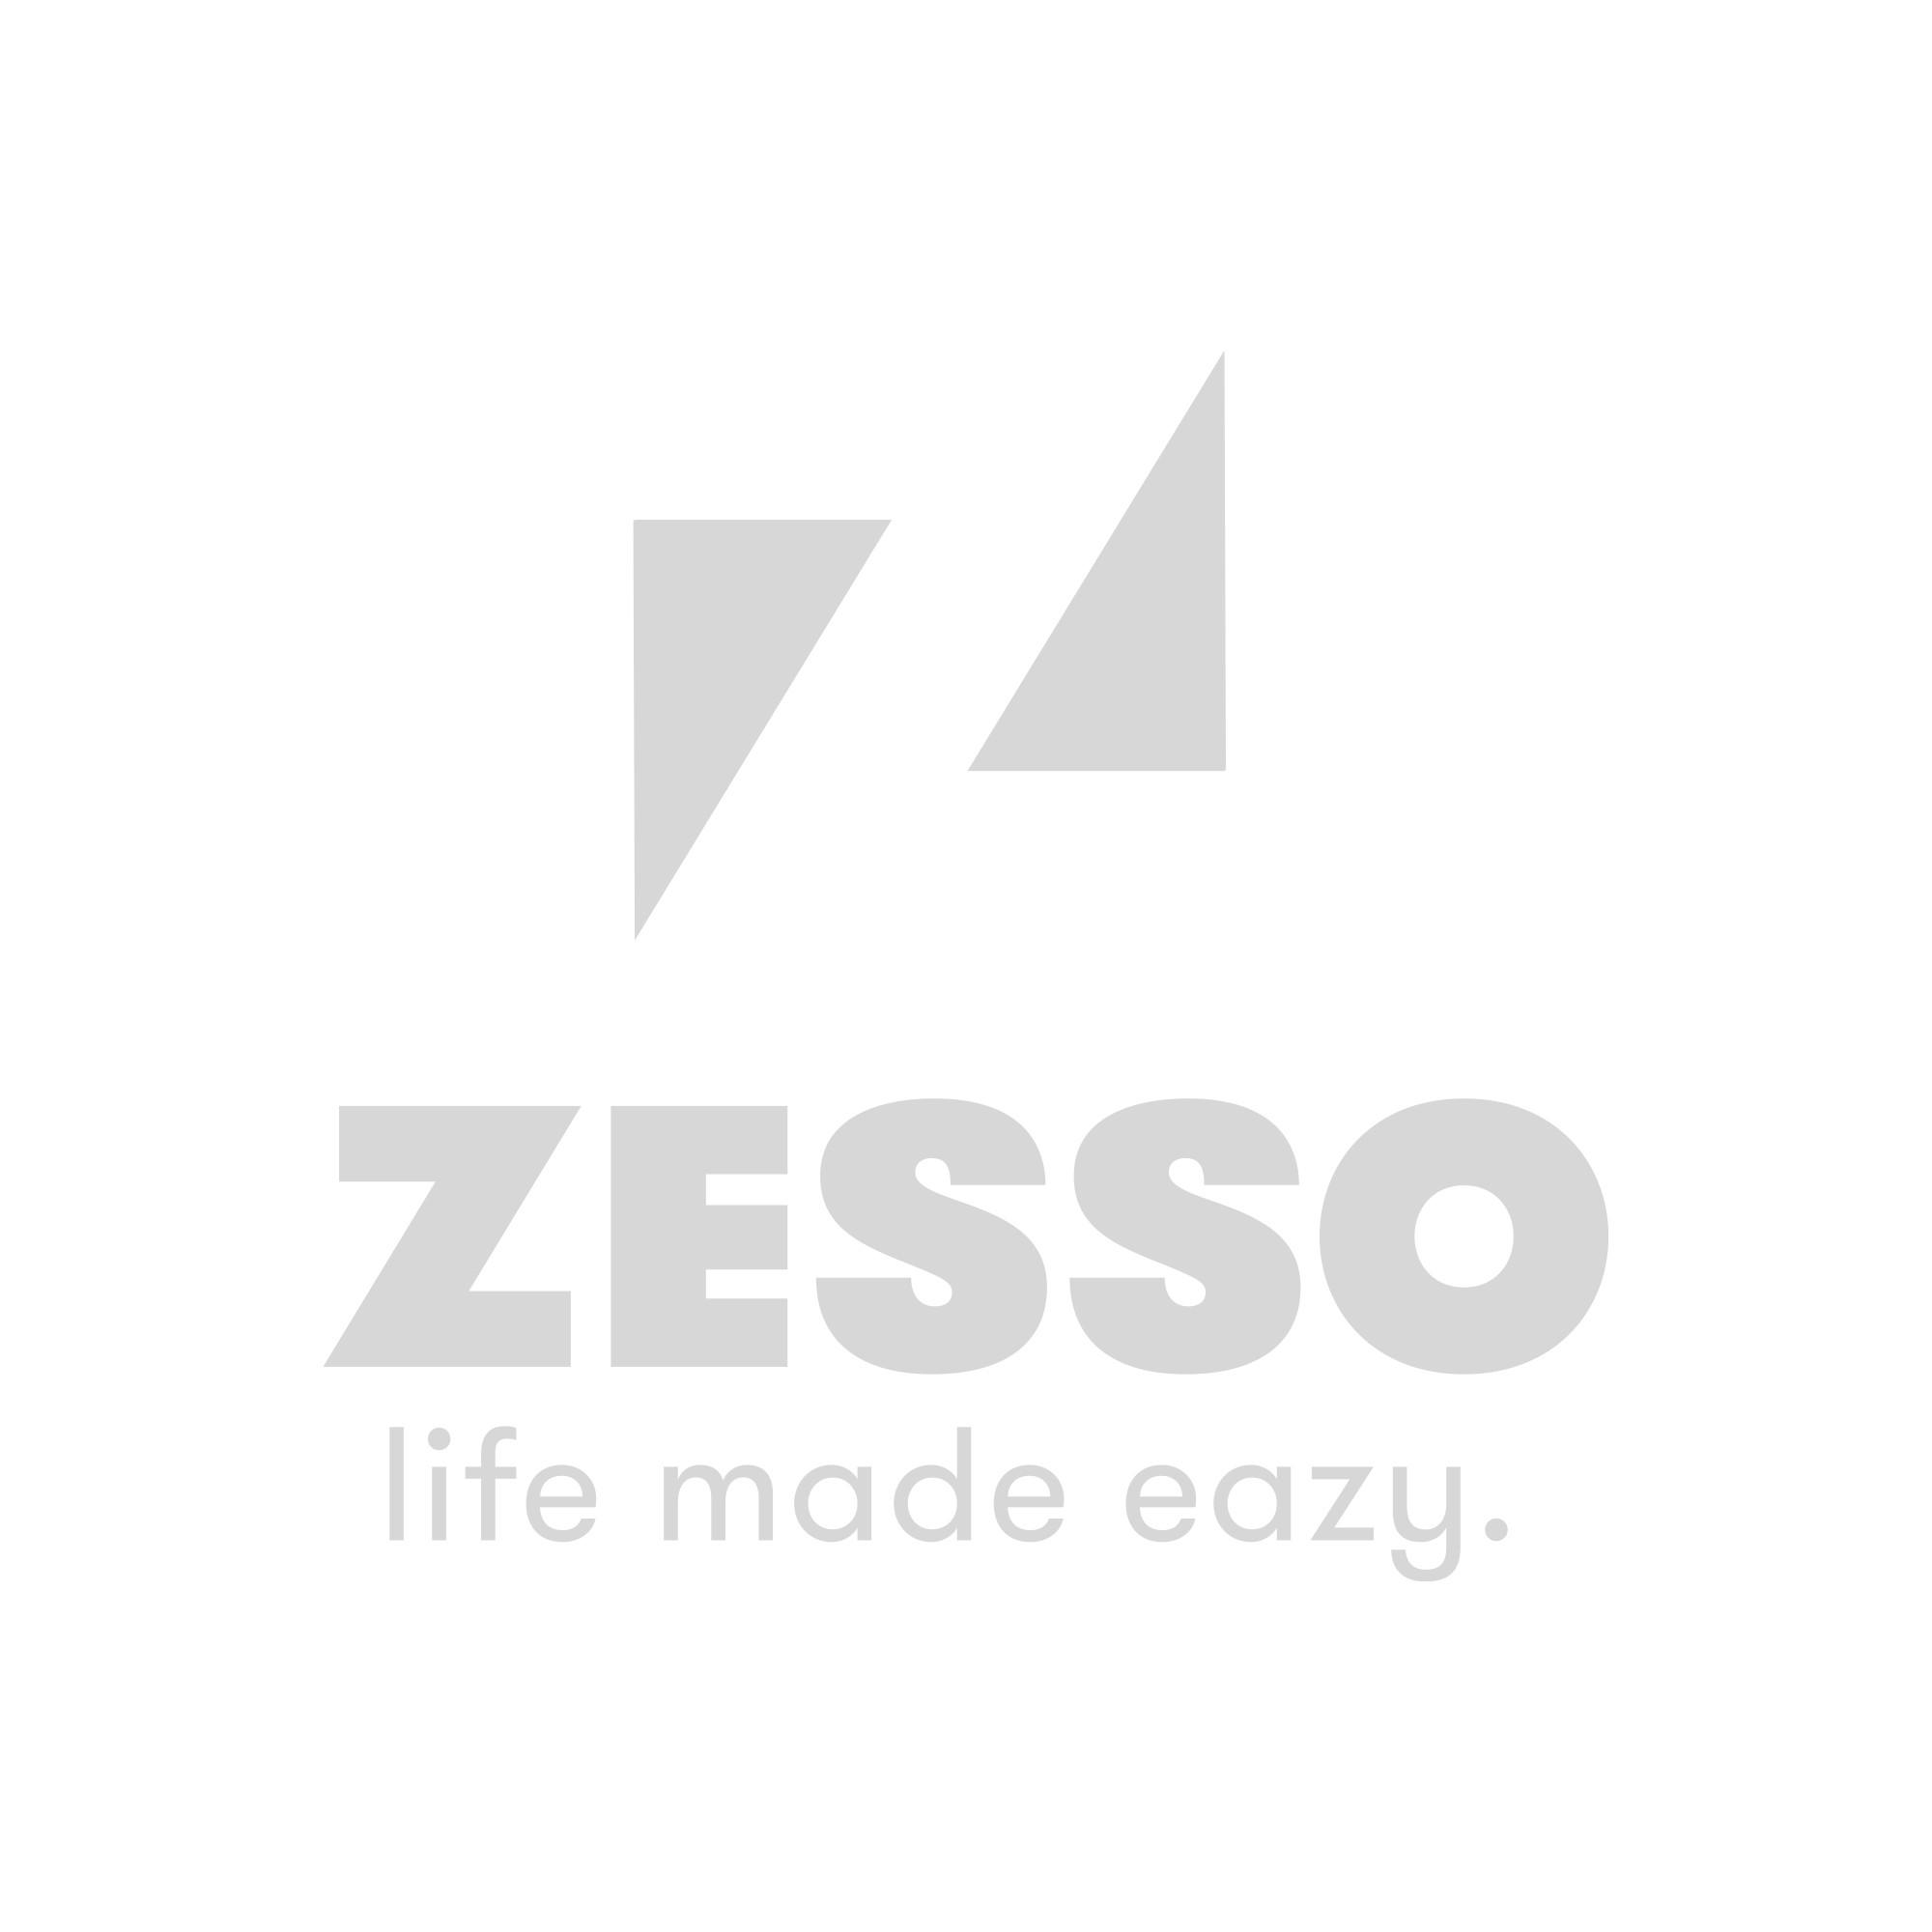 Dalber Hanglamp Sweet Love - Glow In The Dark - 3 Lichten